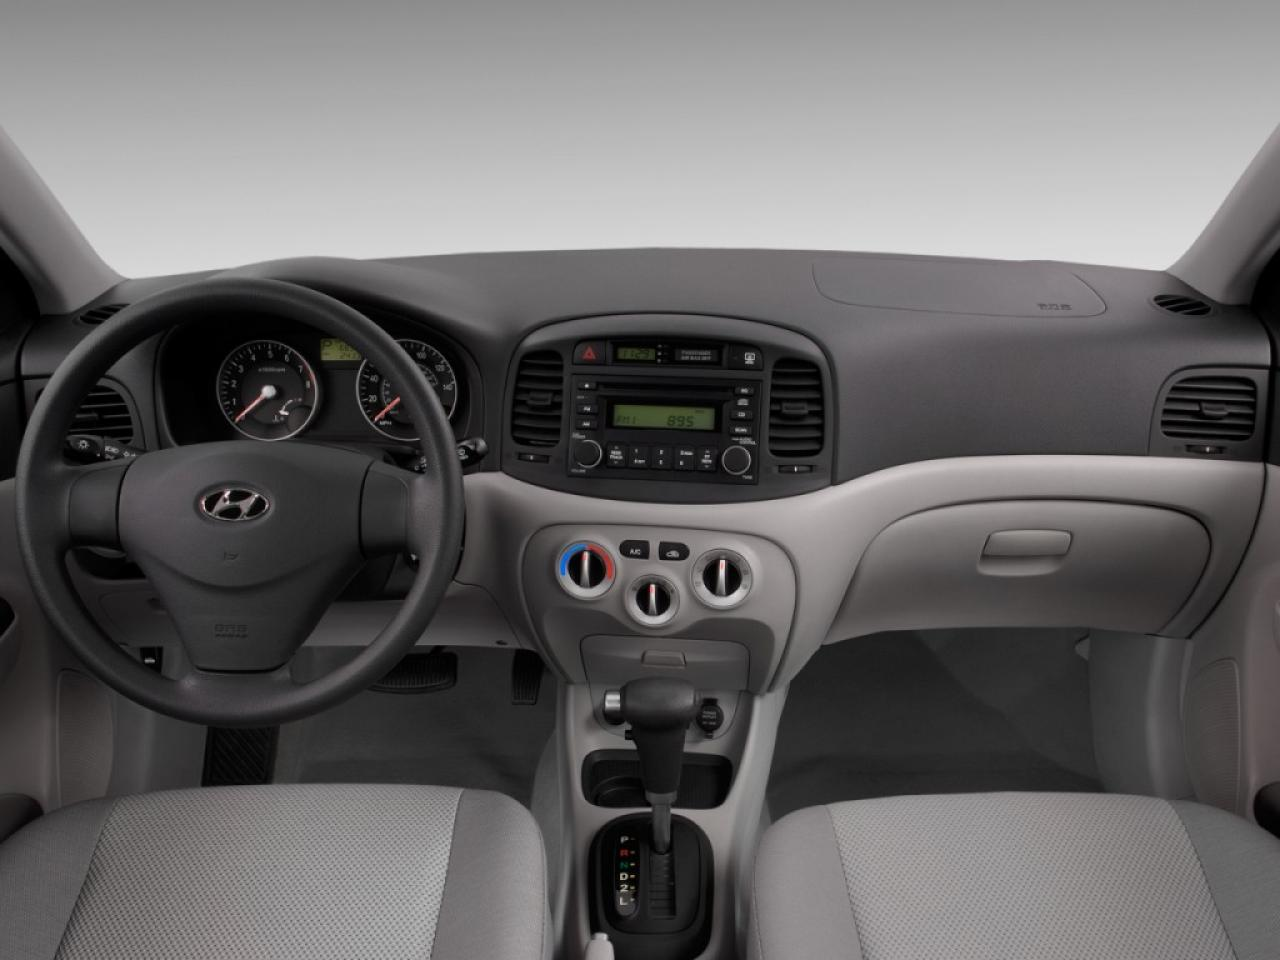 1998 Hyundai Accent Information And Photos Zombiedrive Fuse Box For 2008 Kia 800 1024 1280 1600